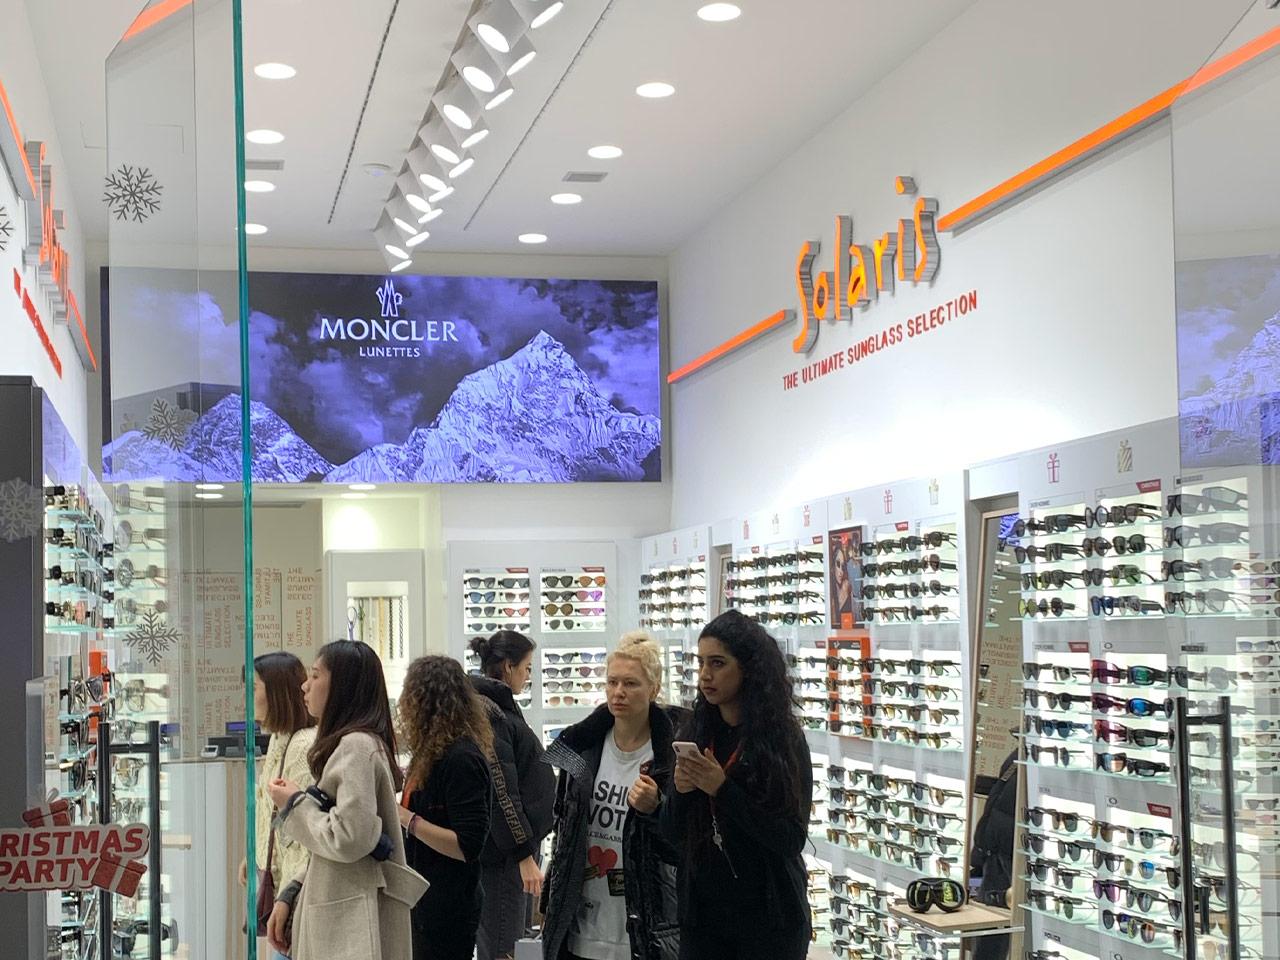 Solaris-ledwall-indoor-schermi-da-interni-fondo-store-retro-cassa-1280x960